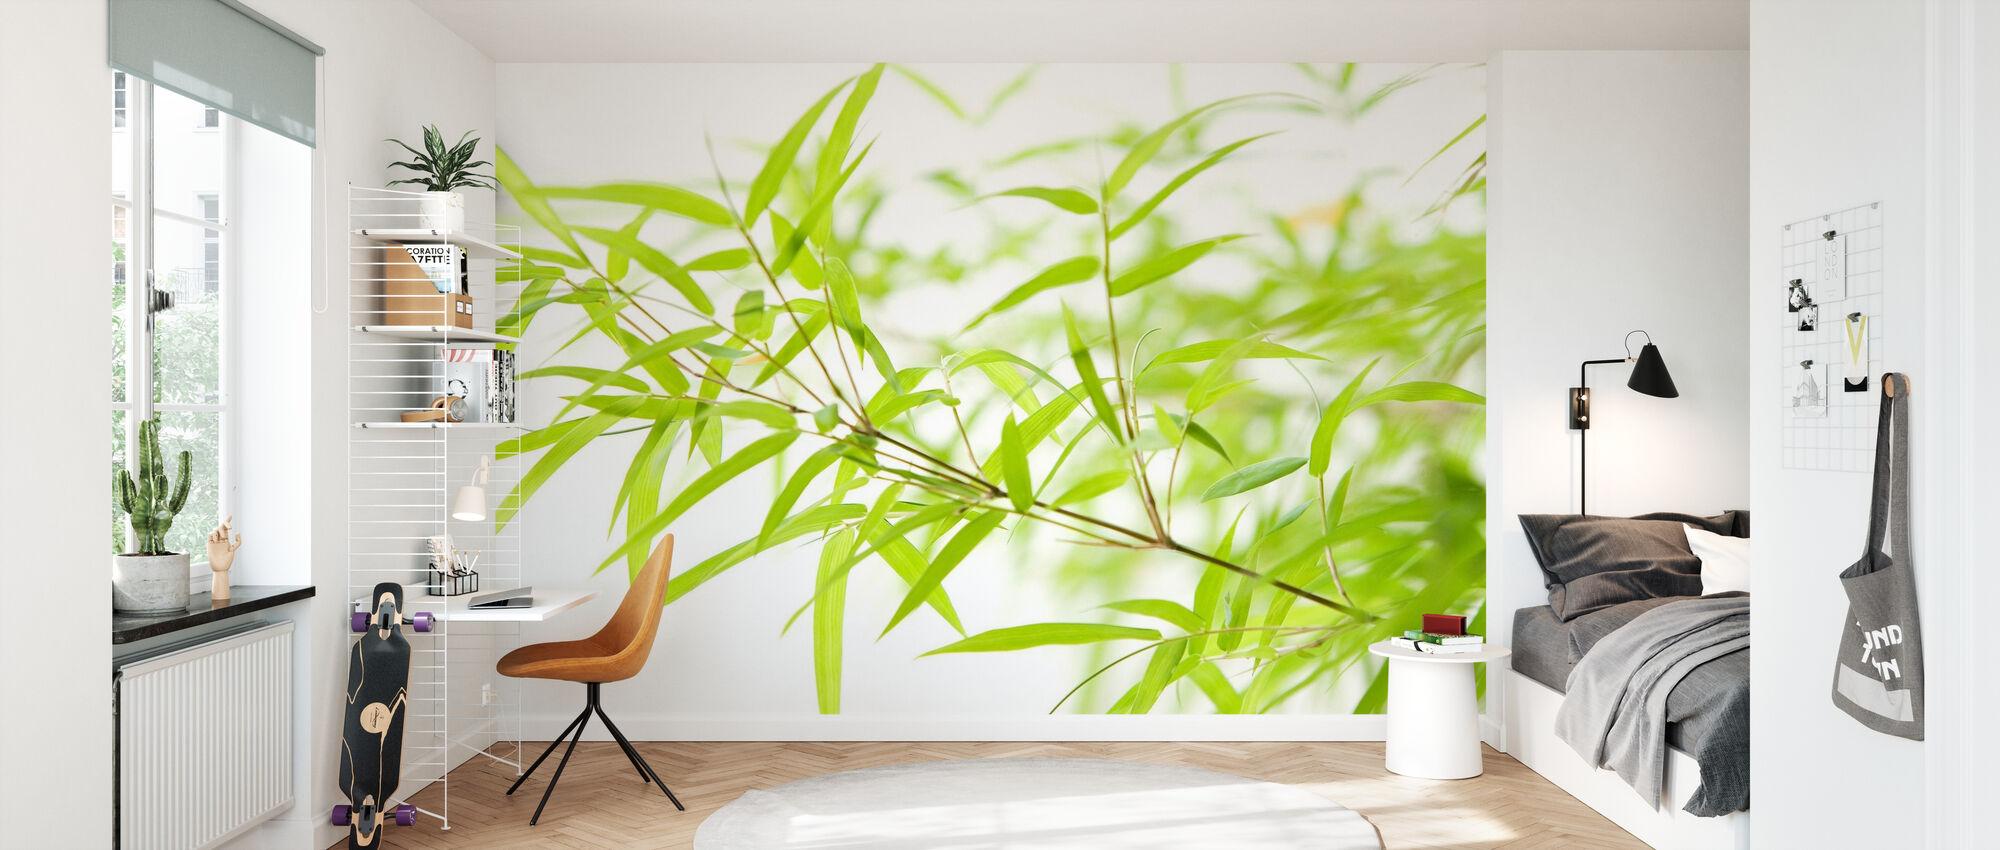 Miniature Bamboo - Wallpaper - Kids Room